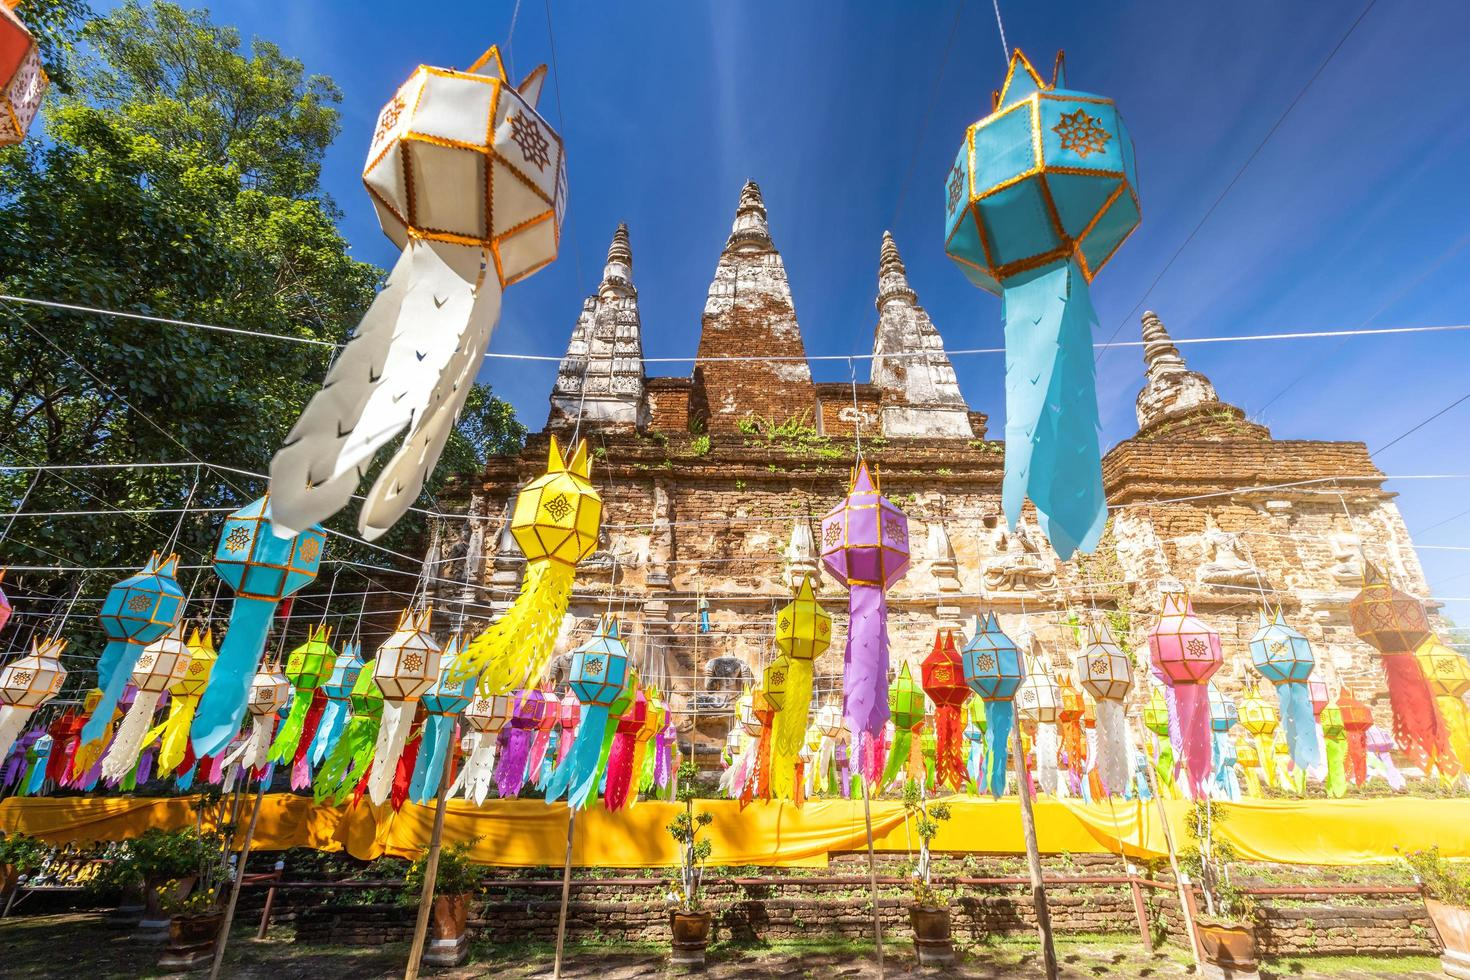 heldere en kleurrijke lanna-lantaarns hangen op yi peng festival in thailand foto